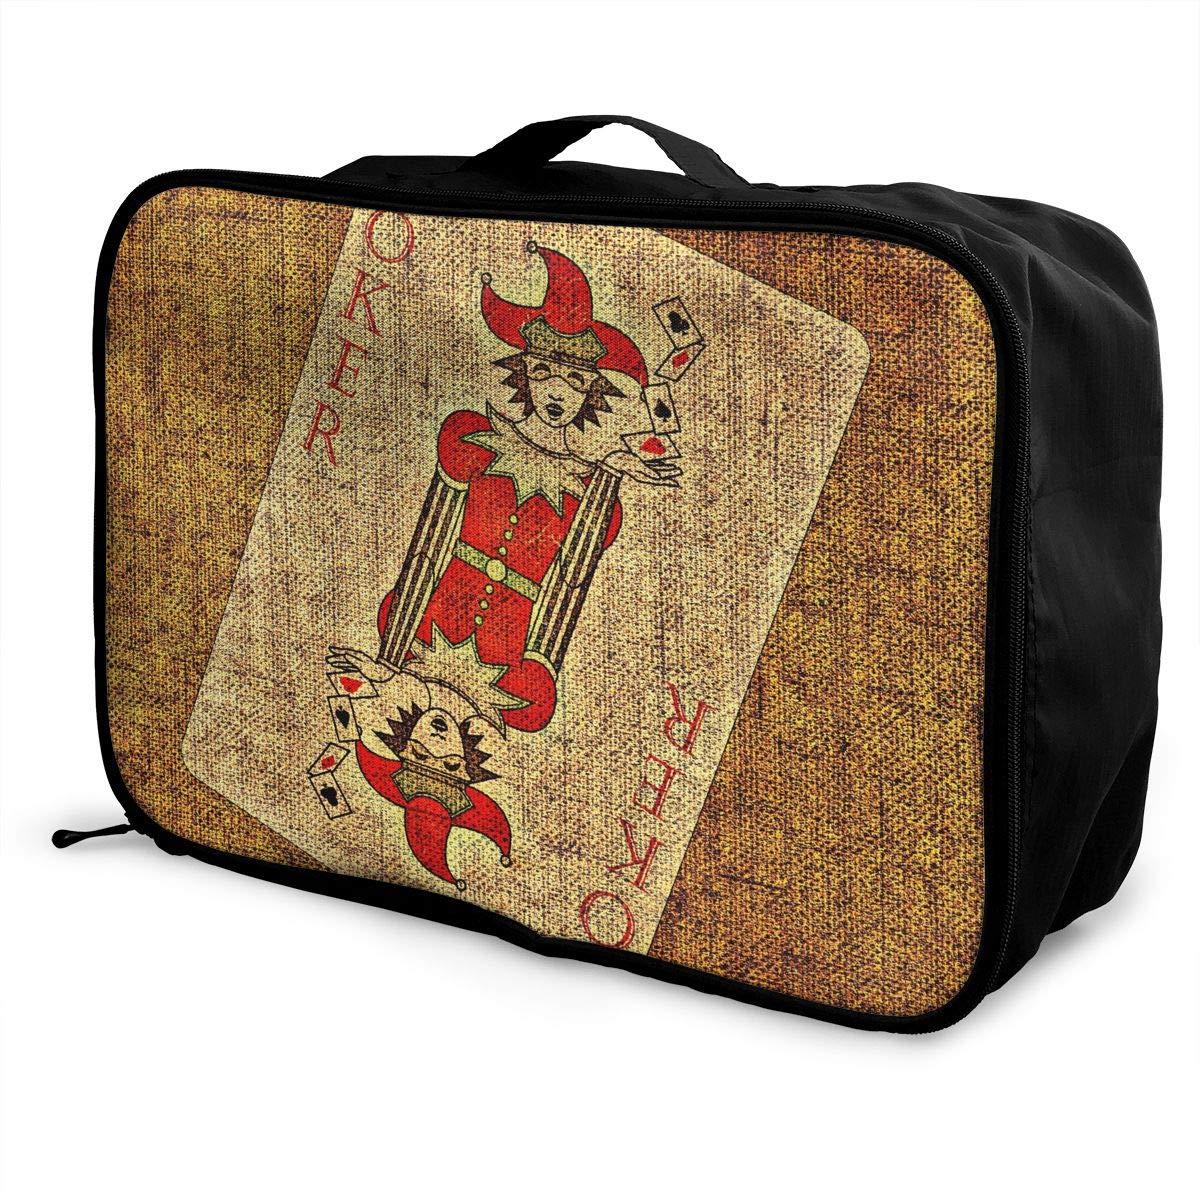 ADGAI Solitaire Red Joker Joker Canvas Travel Weekender Bag,Fashion Custom Lightweight Large Capacity Portable Luggage Bag,Suitcase Trolley Bag